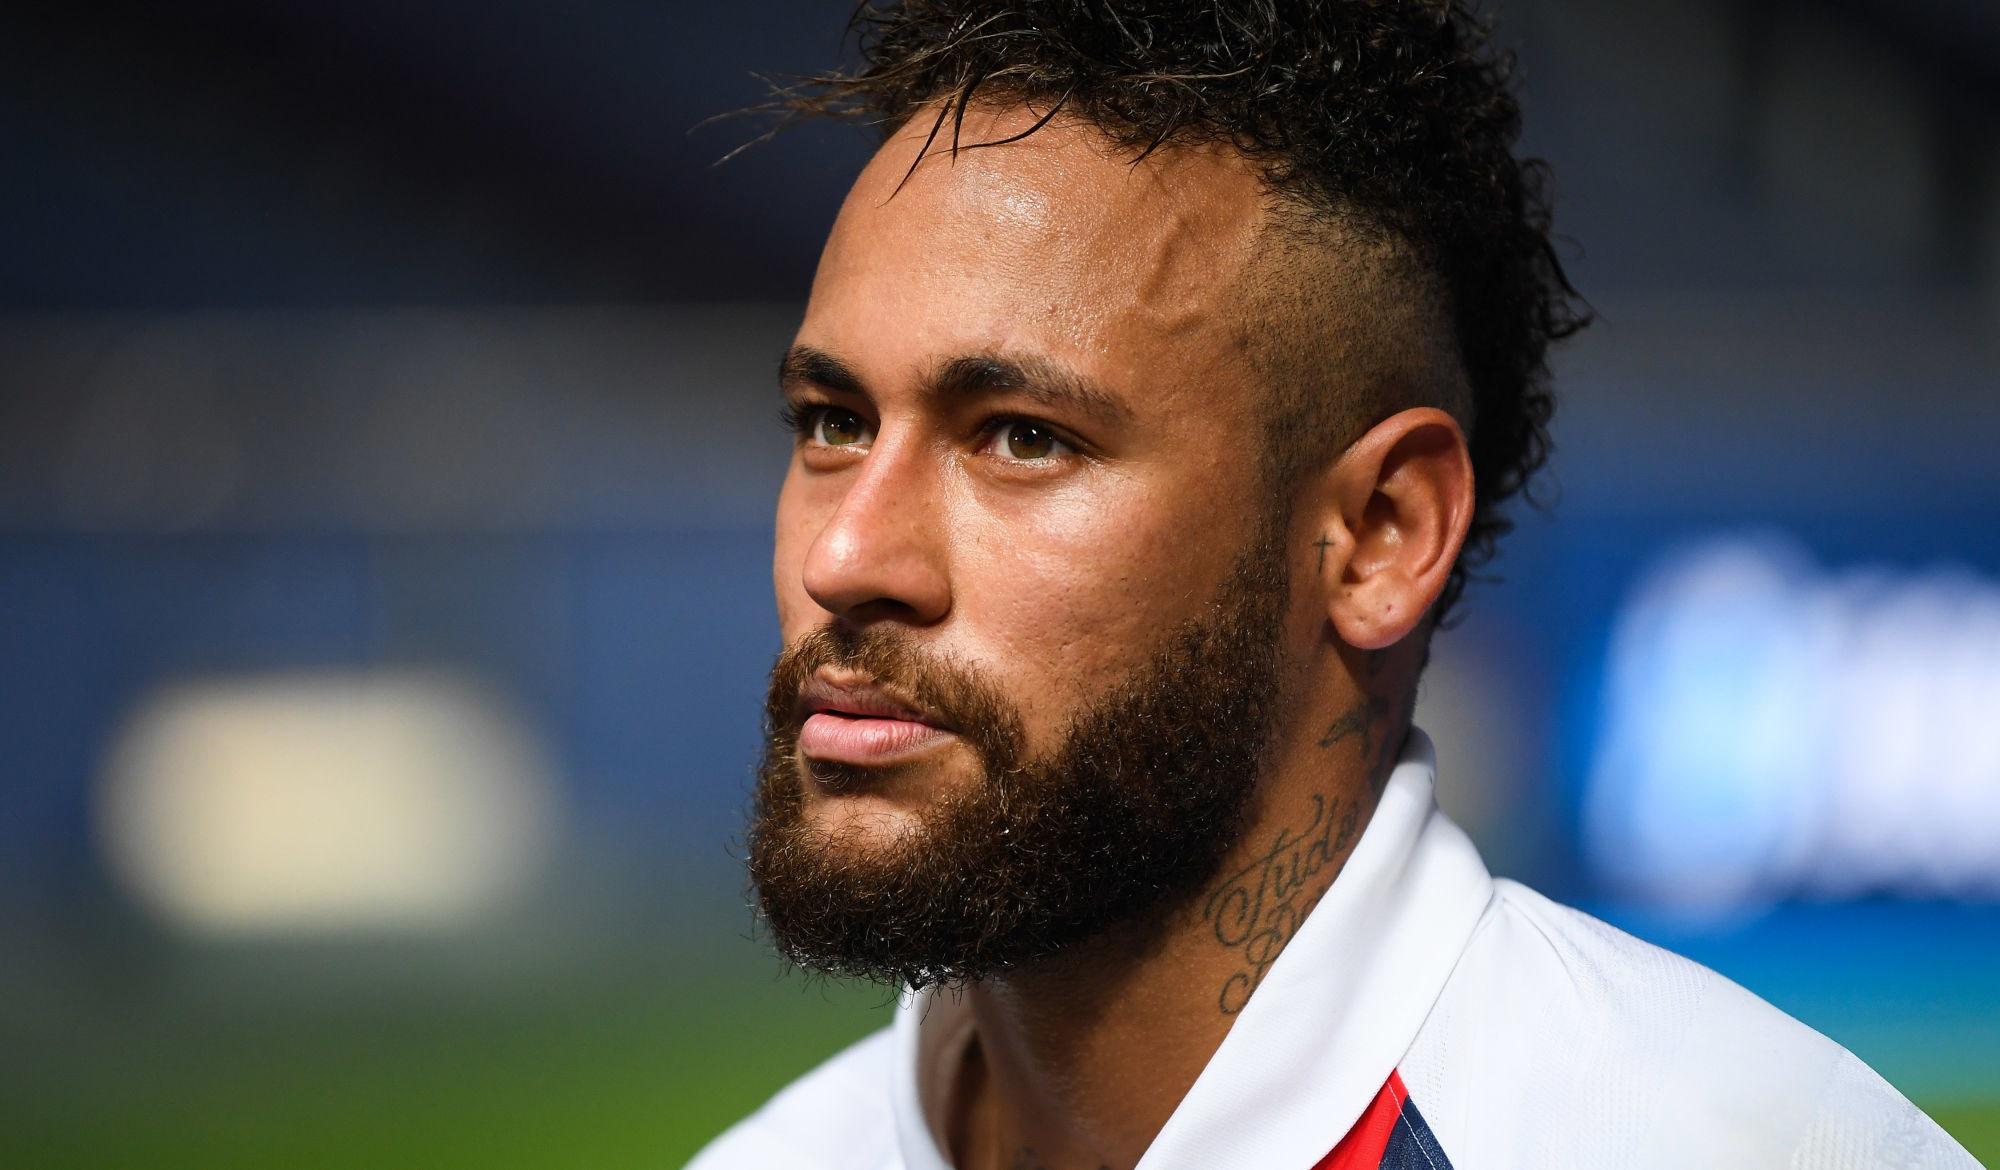 La Gazzetta dello Sport s'en prend au PSG après la qualification contre l'Atalanta